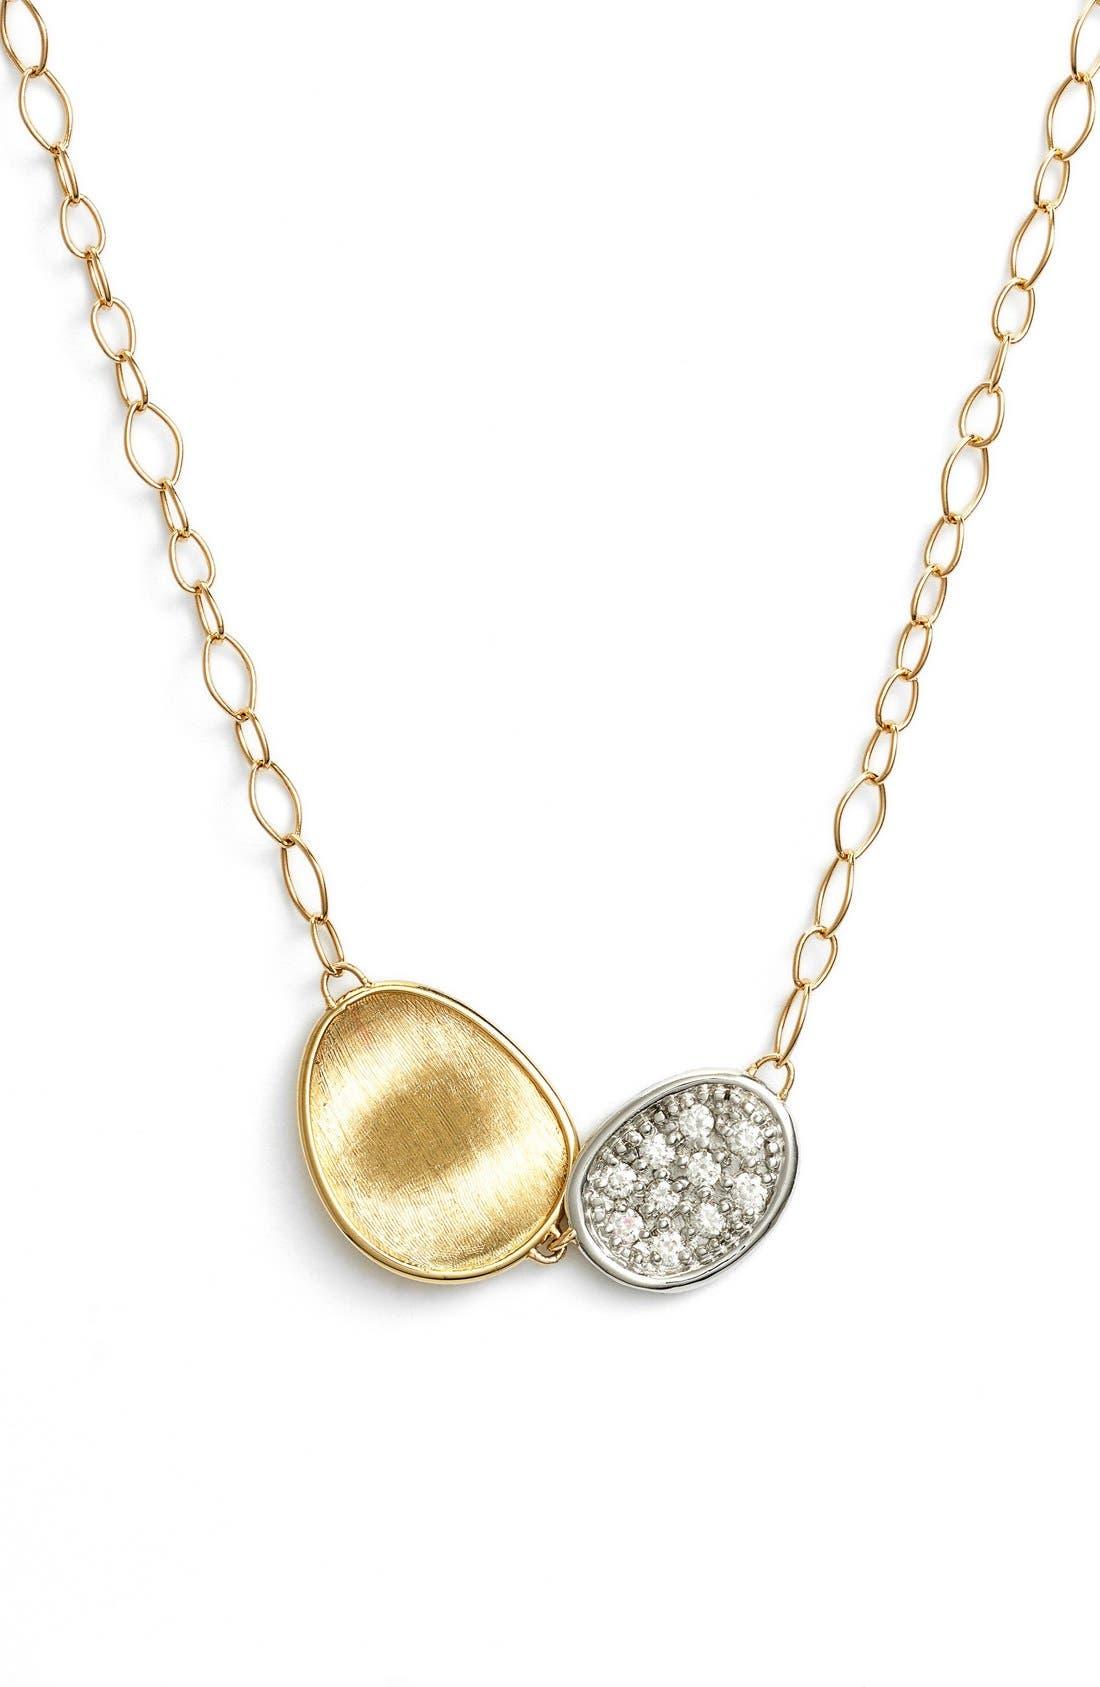 Lunaria Pendant Necklace,                             Main thumbnail 1, color,                             Yellow Gold